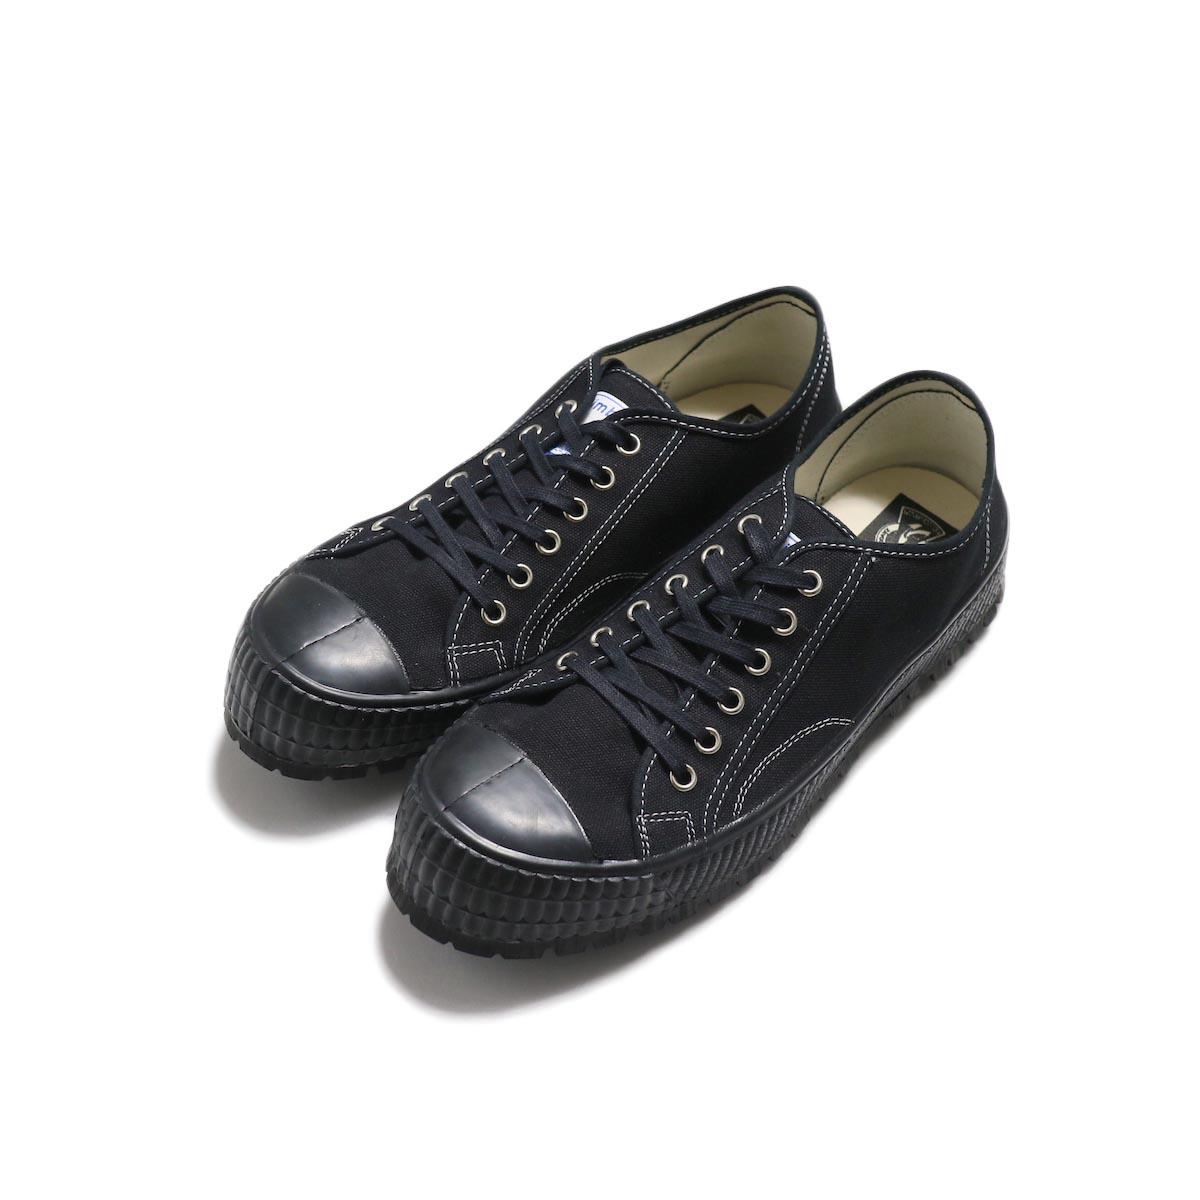 ZDA / 2100-F Climber Sole Cnavas Sneaker -Black